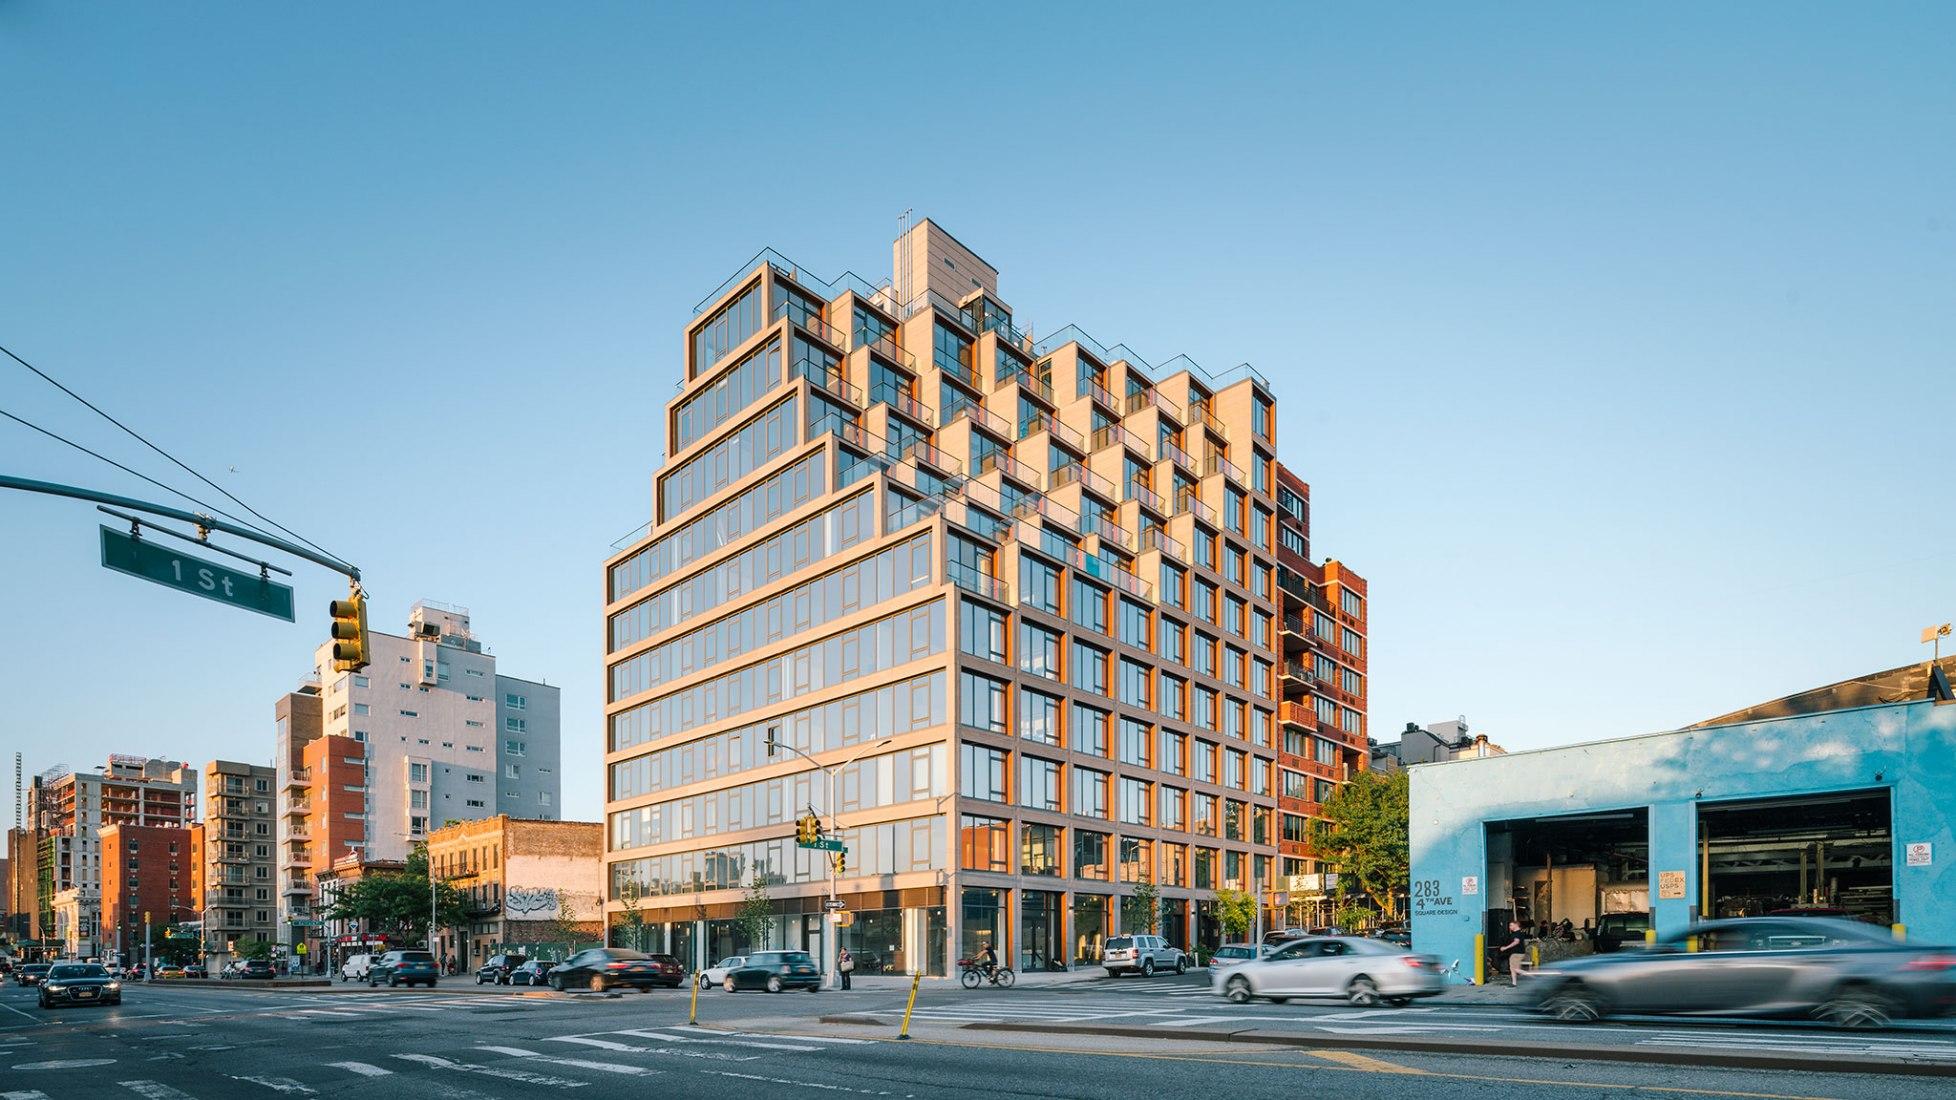 251 1st Street by ODA New York. Photograph © Miguel de Guzman